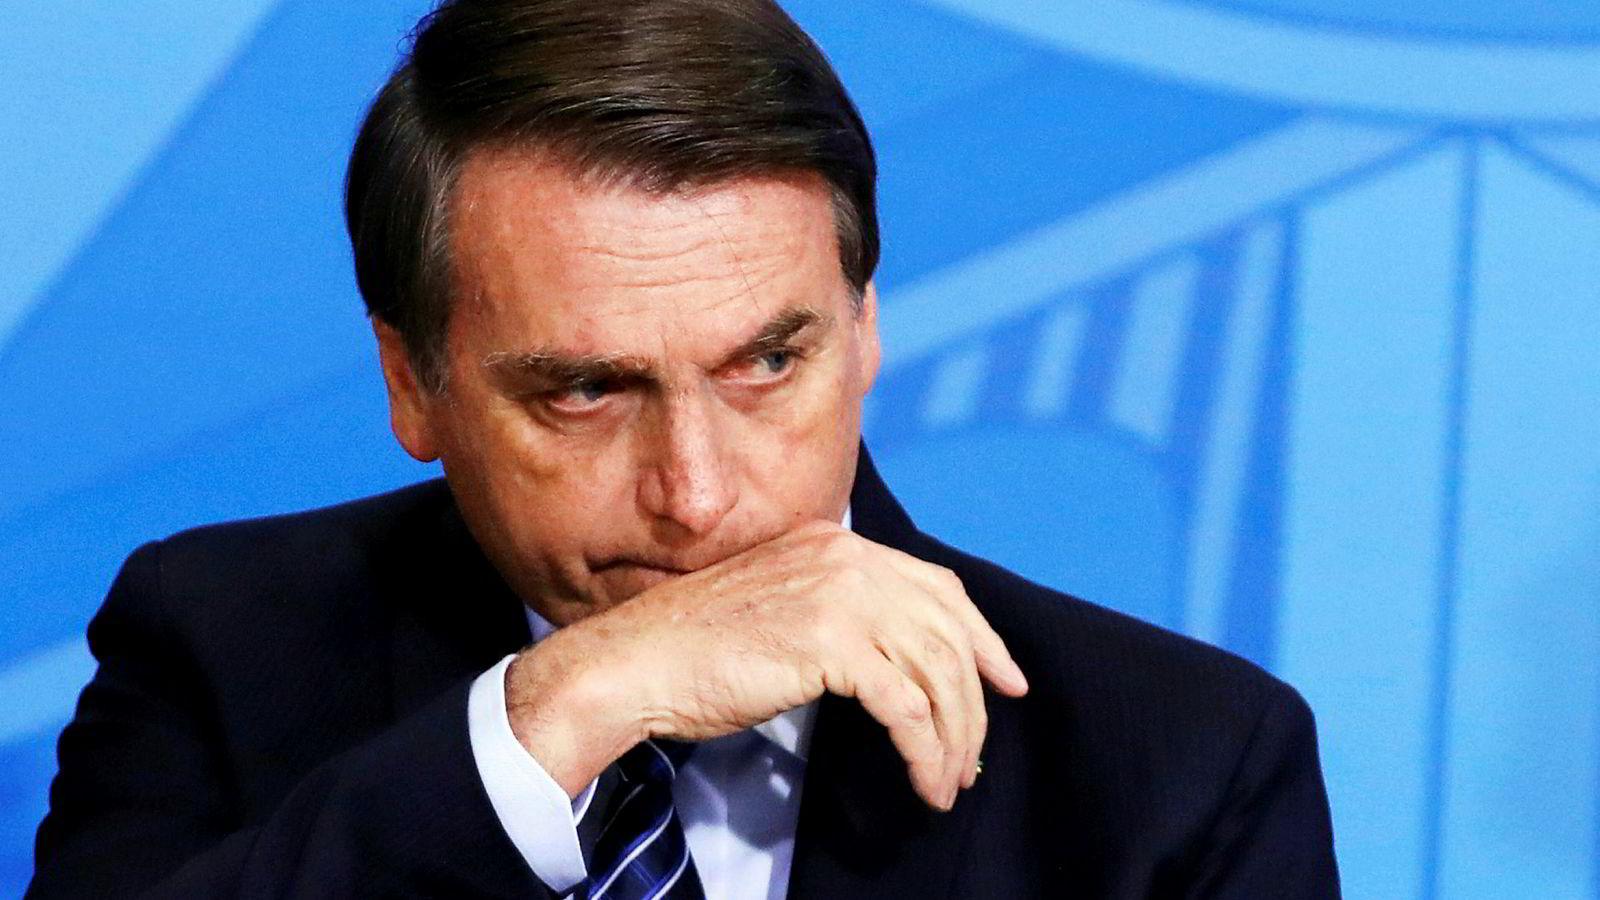 Brasils president, Jair Bolsonaro.